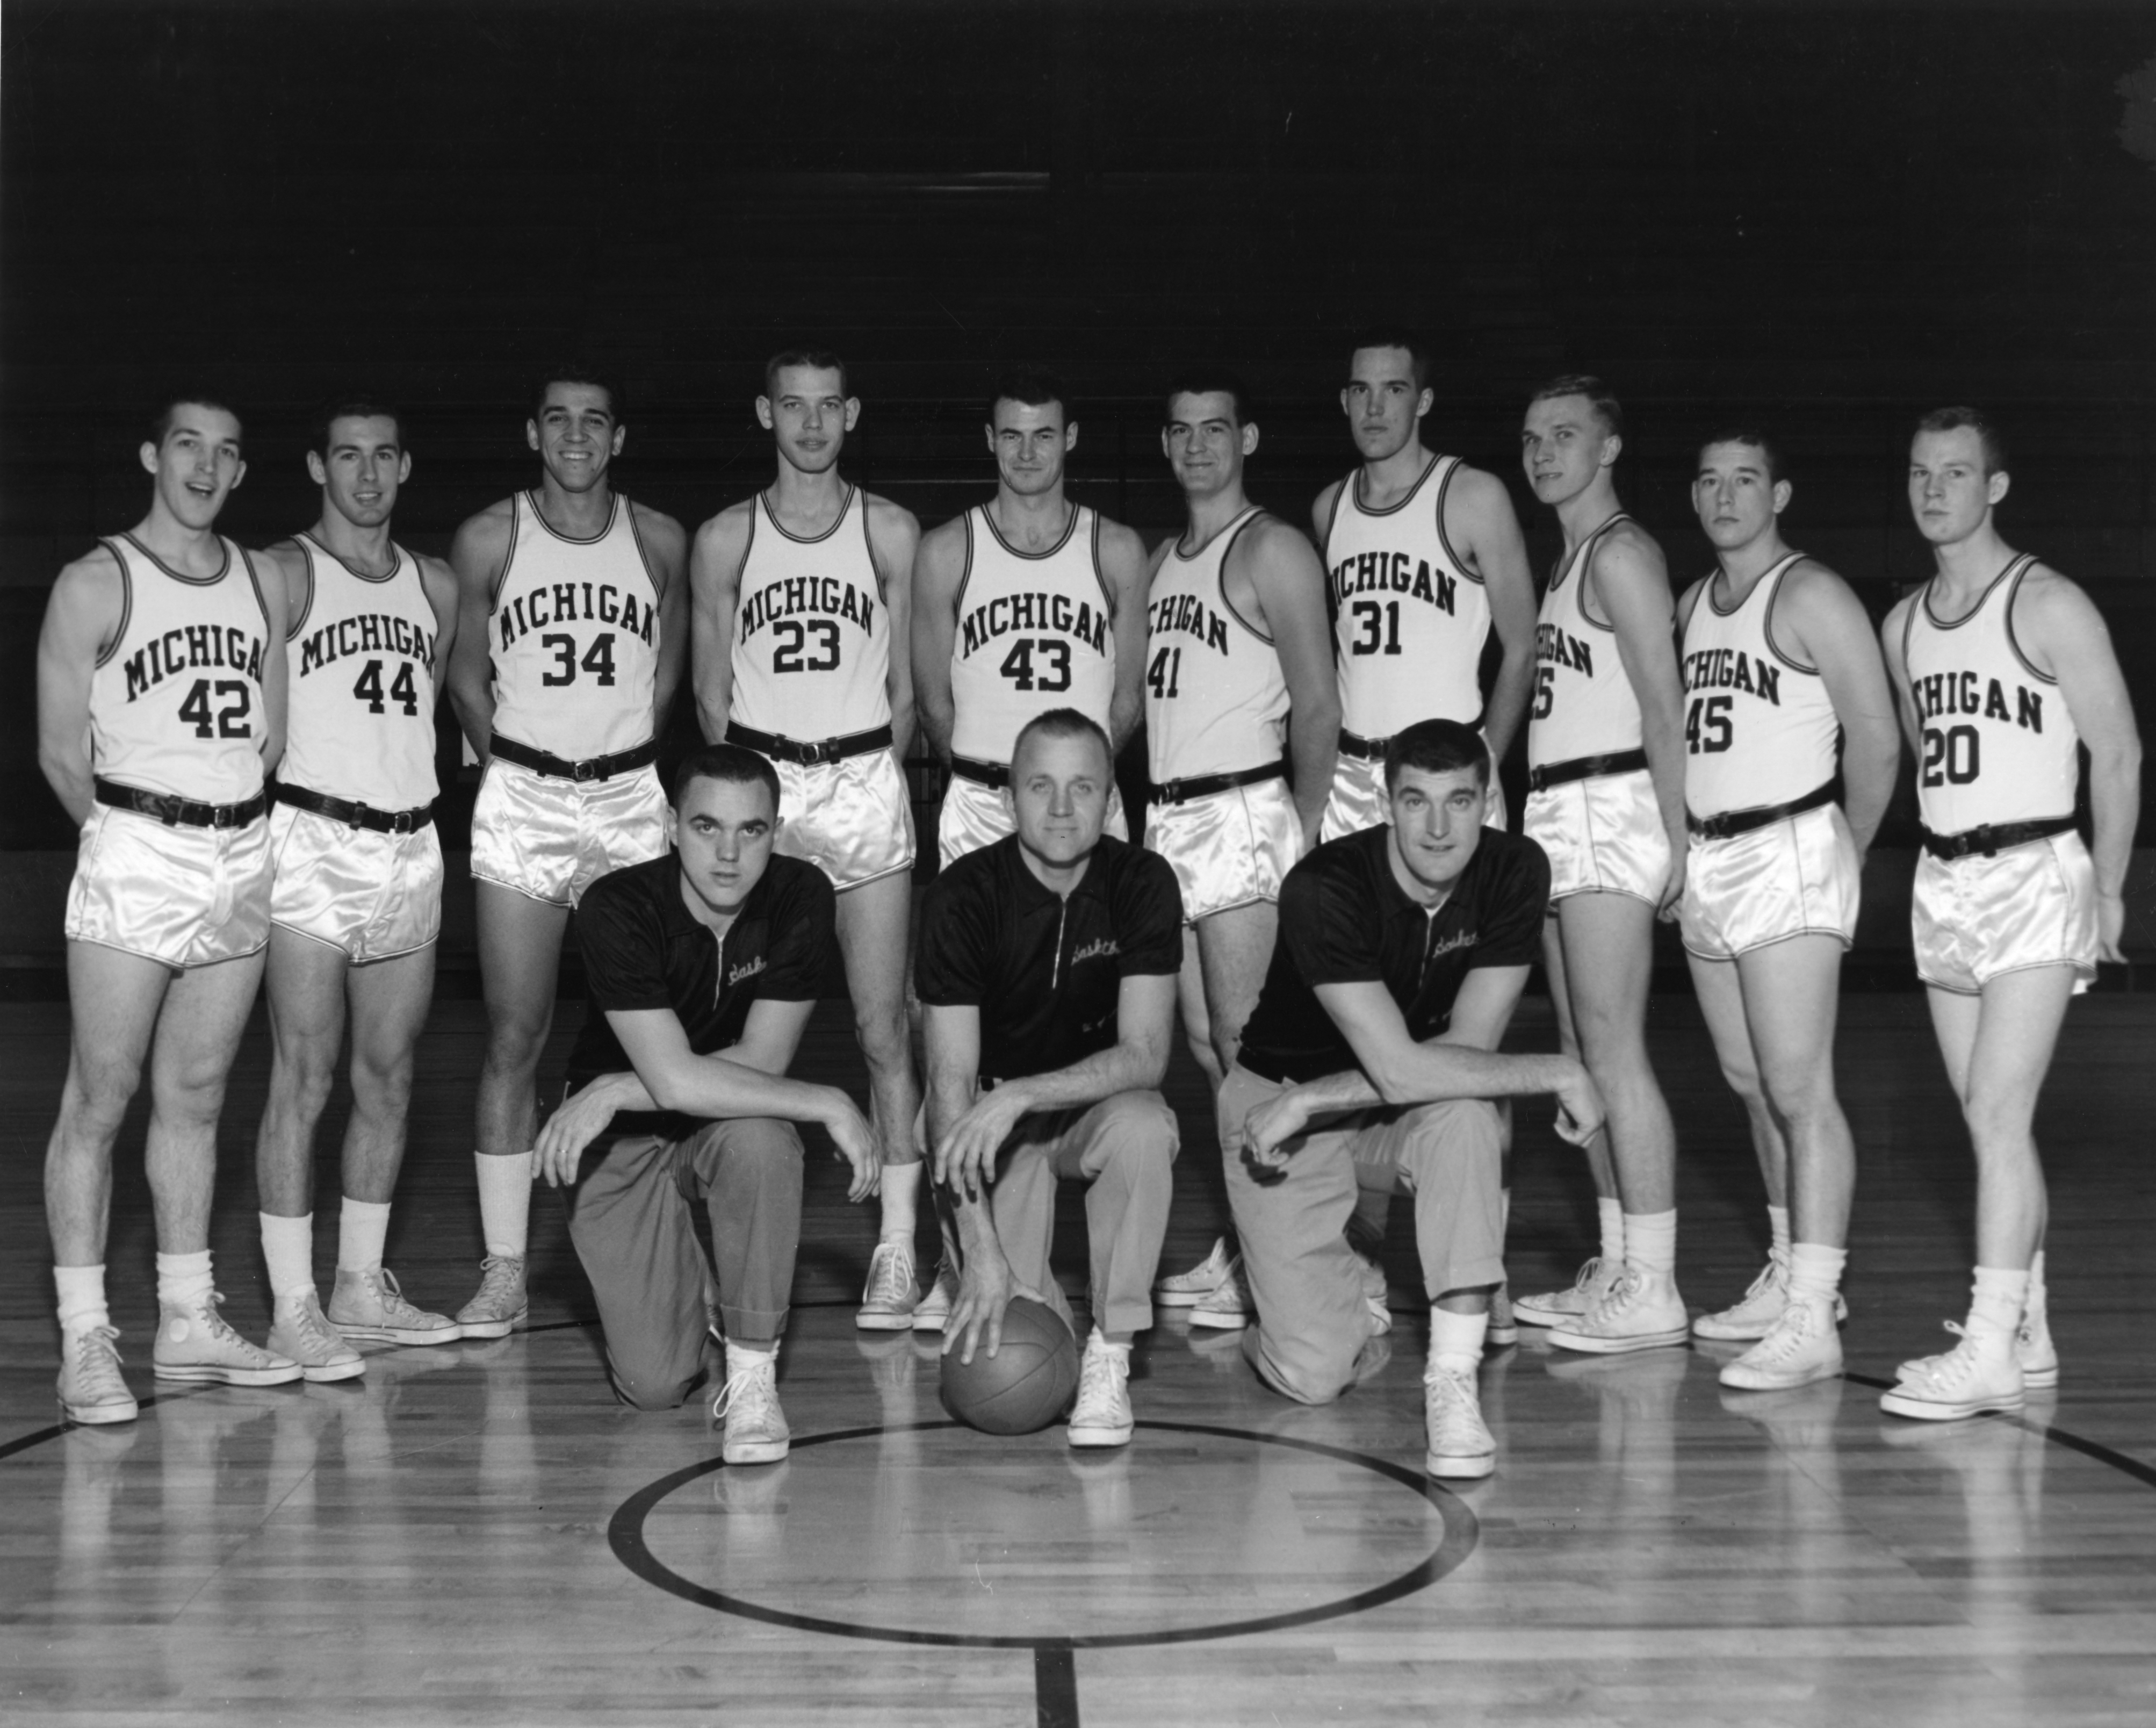 File:1961 Michigan Wolverines men's basketball team.jpg - Wikimedia Commons